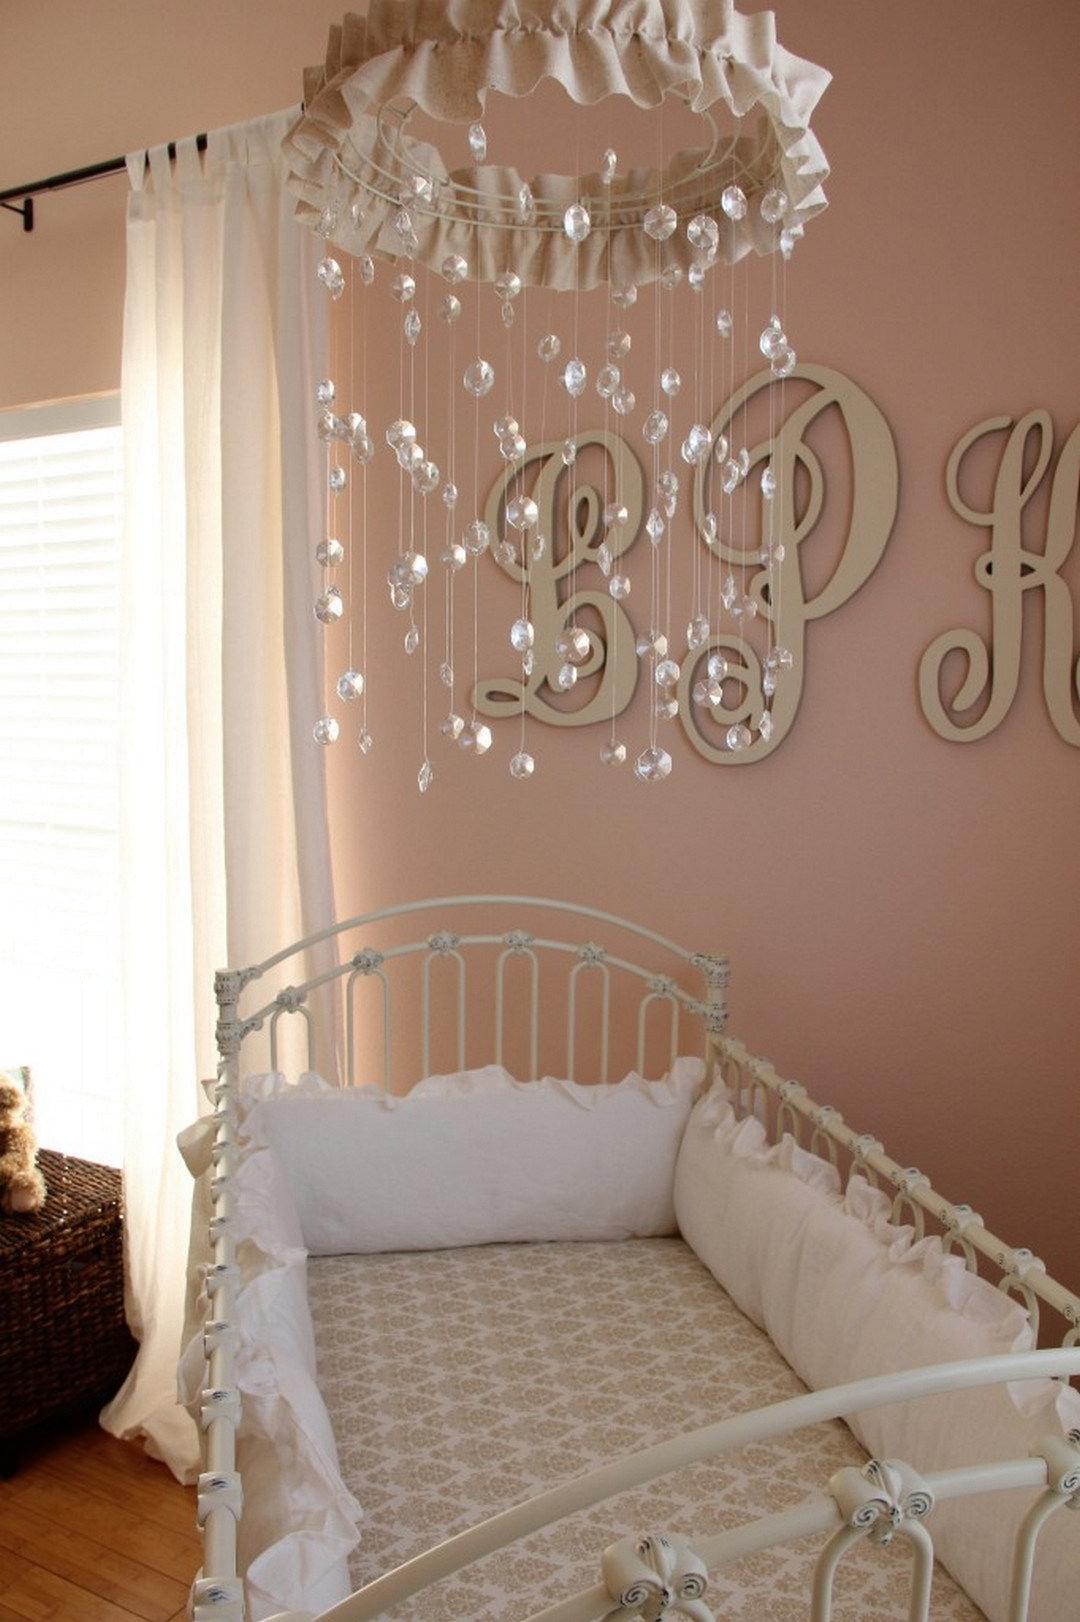 Kinderzimmer decke design cute baby girl nursery idea   baby bed  pinterest  baby